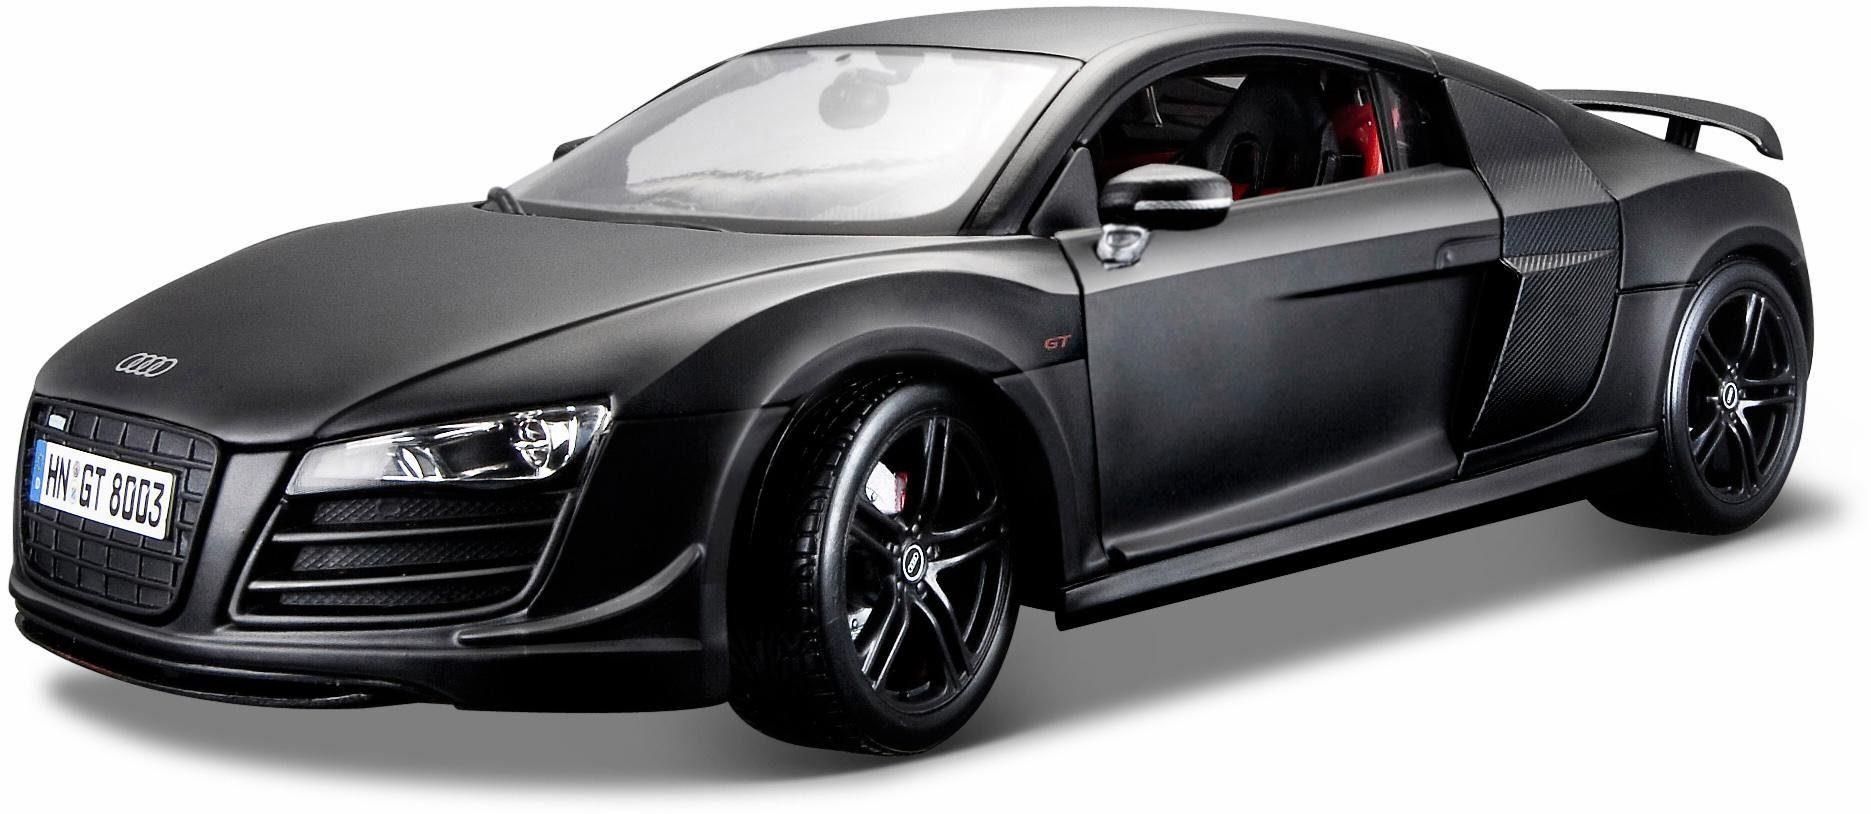 Maisto® Sammlerauto, »Audi R8 GT3, 1:18, schwarz«